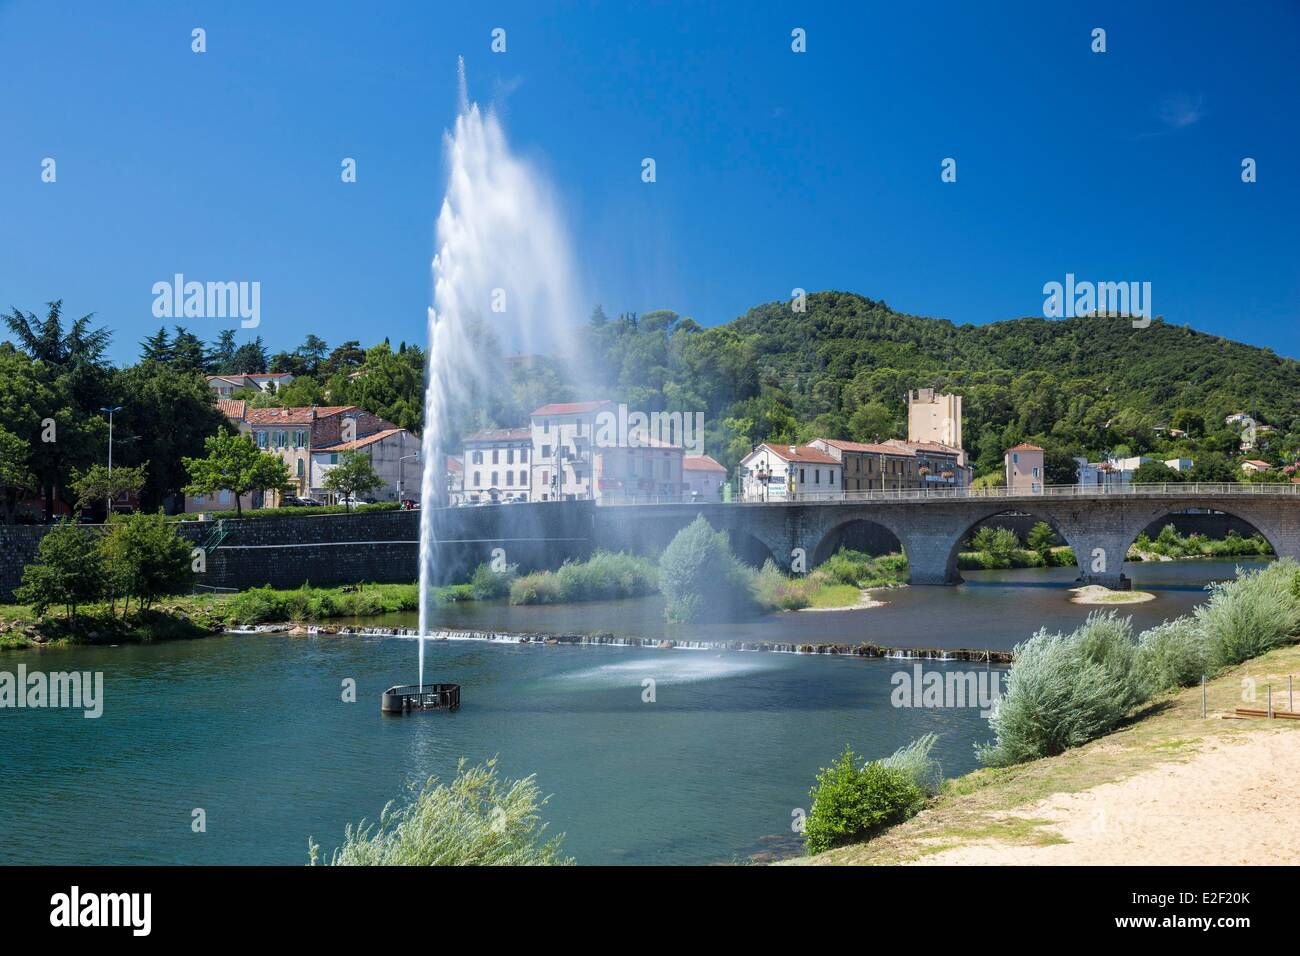 France, Gard, Ales, water jet on the Gardon - Stock Image